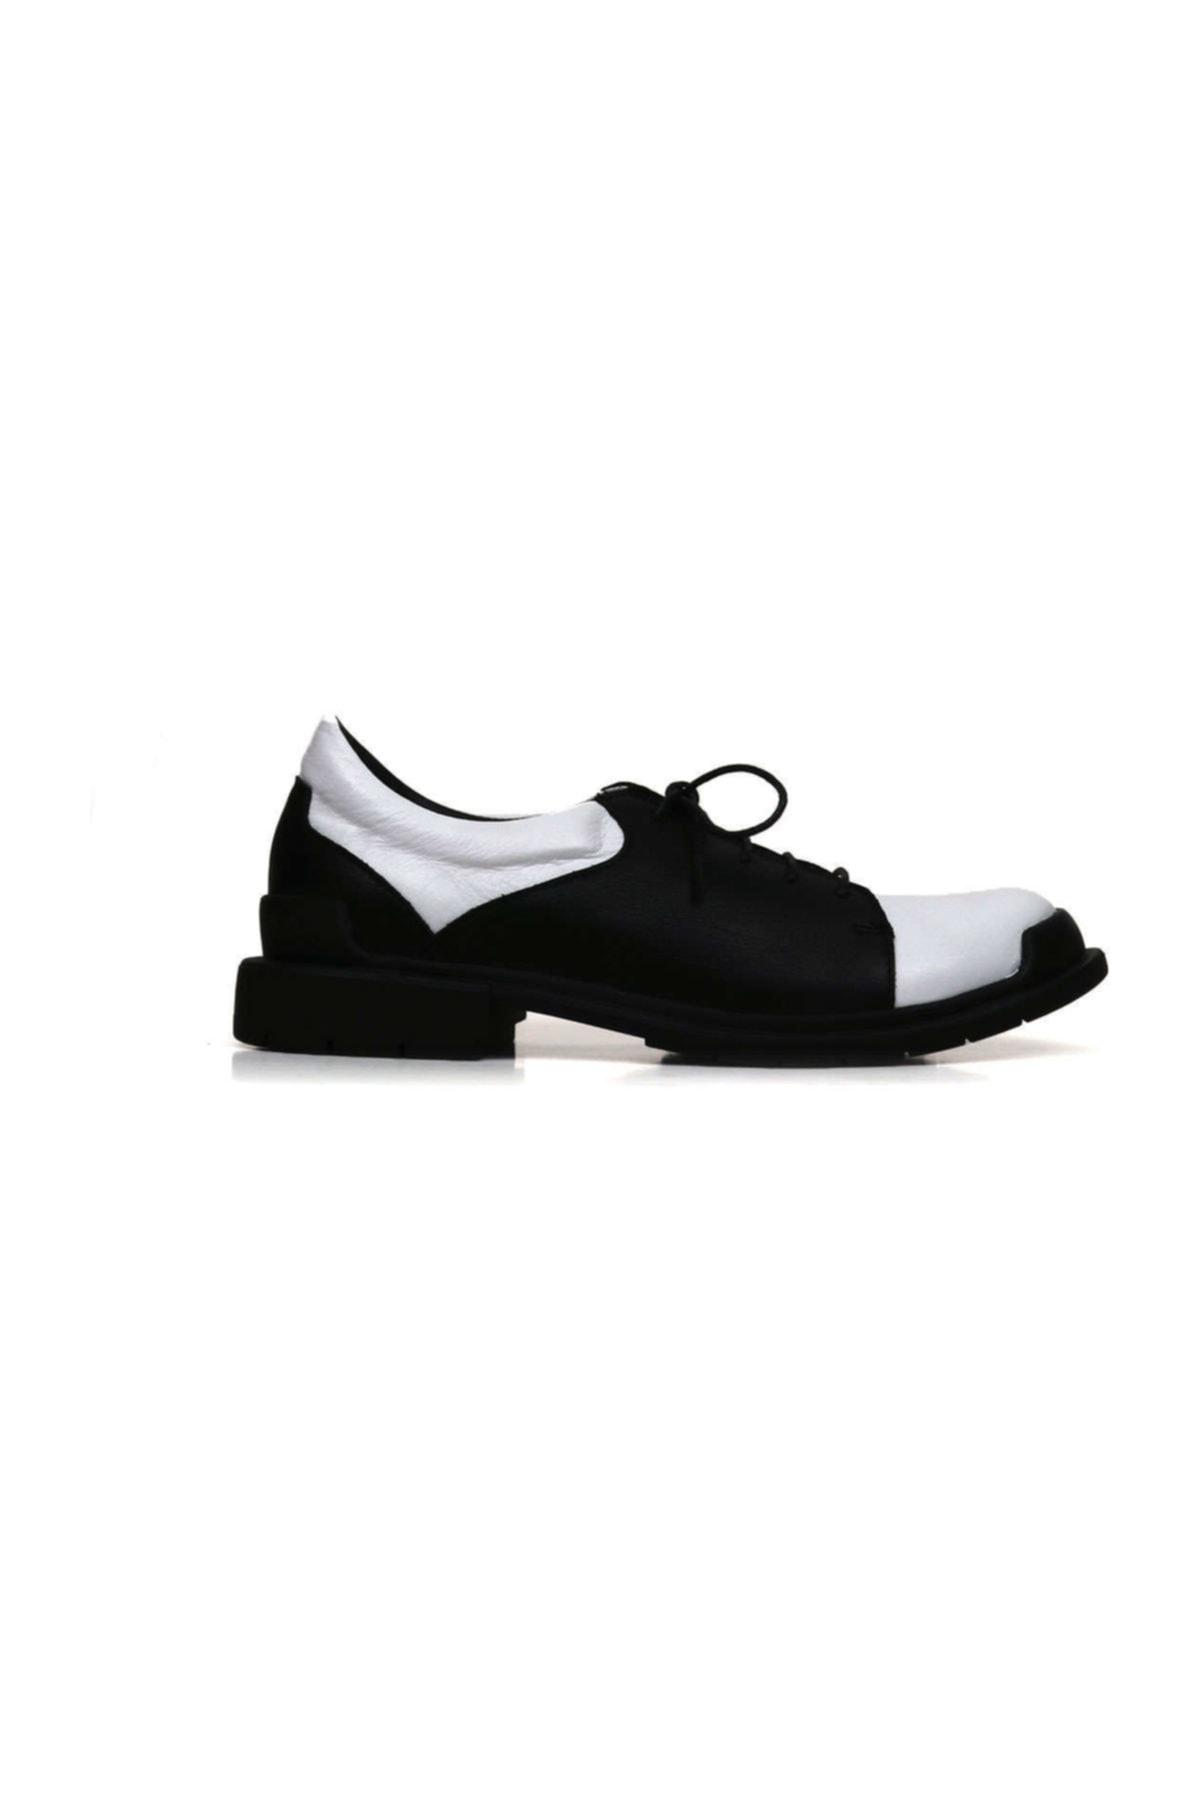 BUENO Shoes  Kadın Ayakkabı 9p7709 2